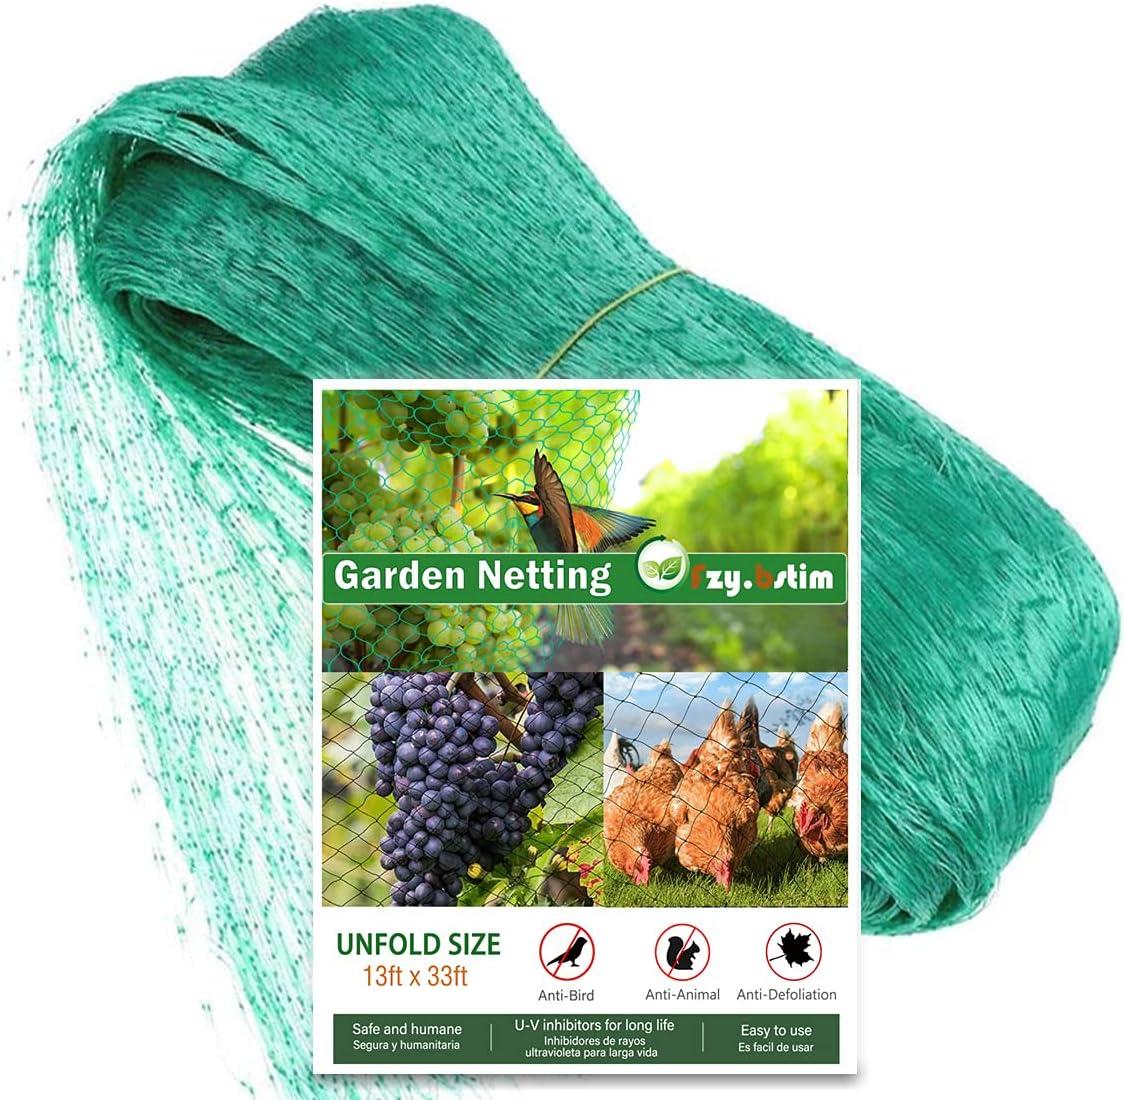 Garden Mesh Netting,Brid Anti Plant Covers Netting for Protect Vegetable Fruits Flowers Crops Greenhouse Row Cover Protection Mesh Net Covers Patio Screen Barrier Net,13x49Ft-0.59